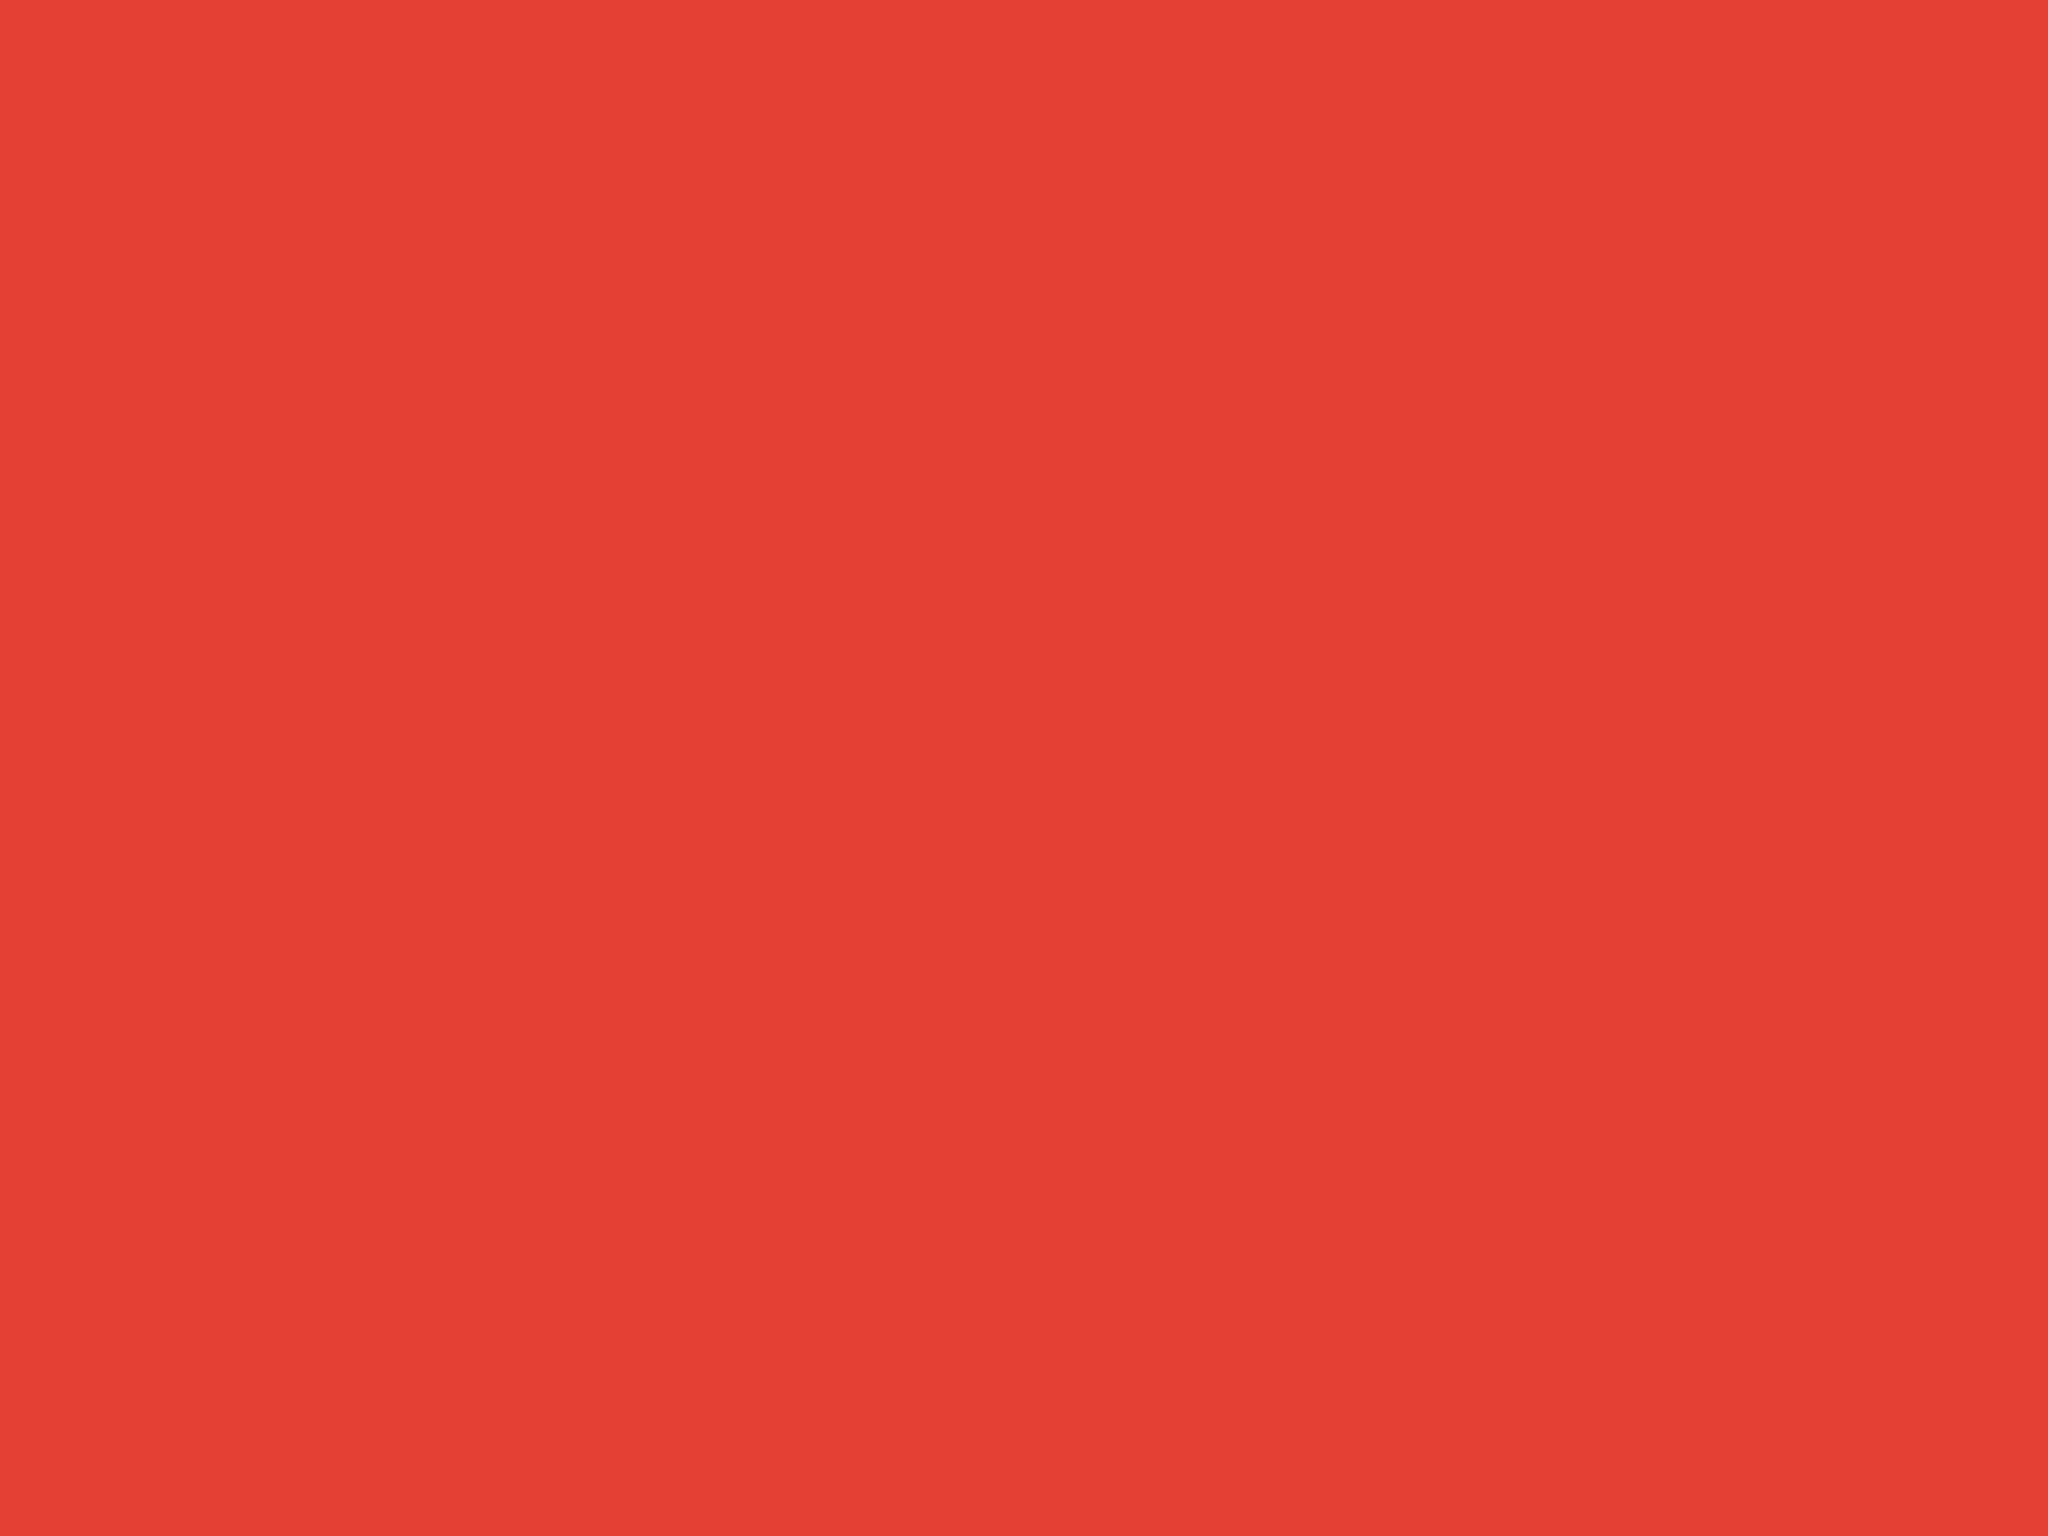 2048x1536 Vermilion Cinnabar Solid Color Background